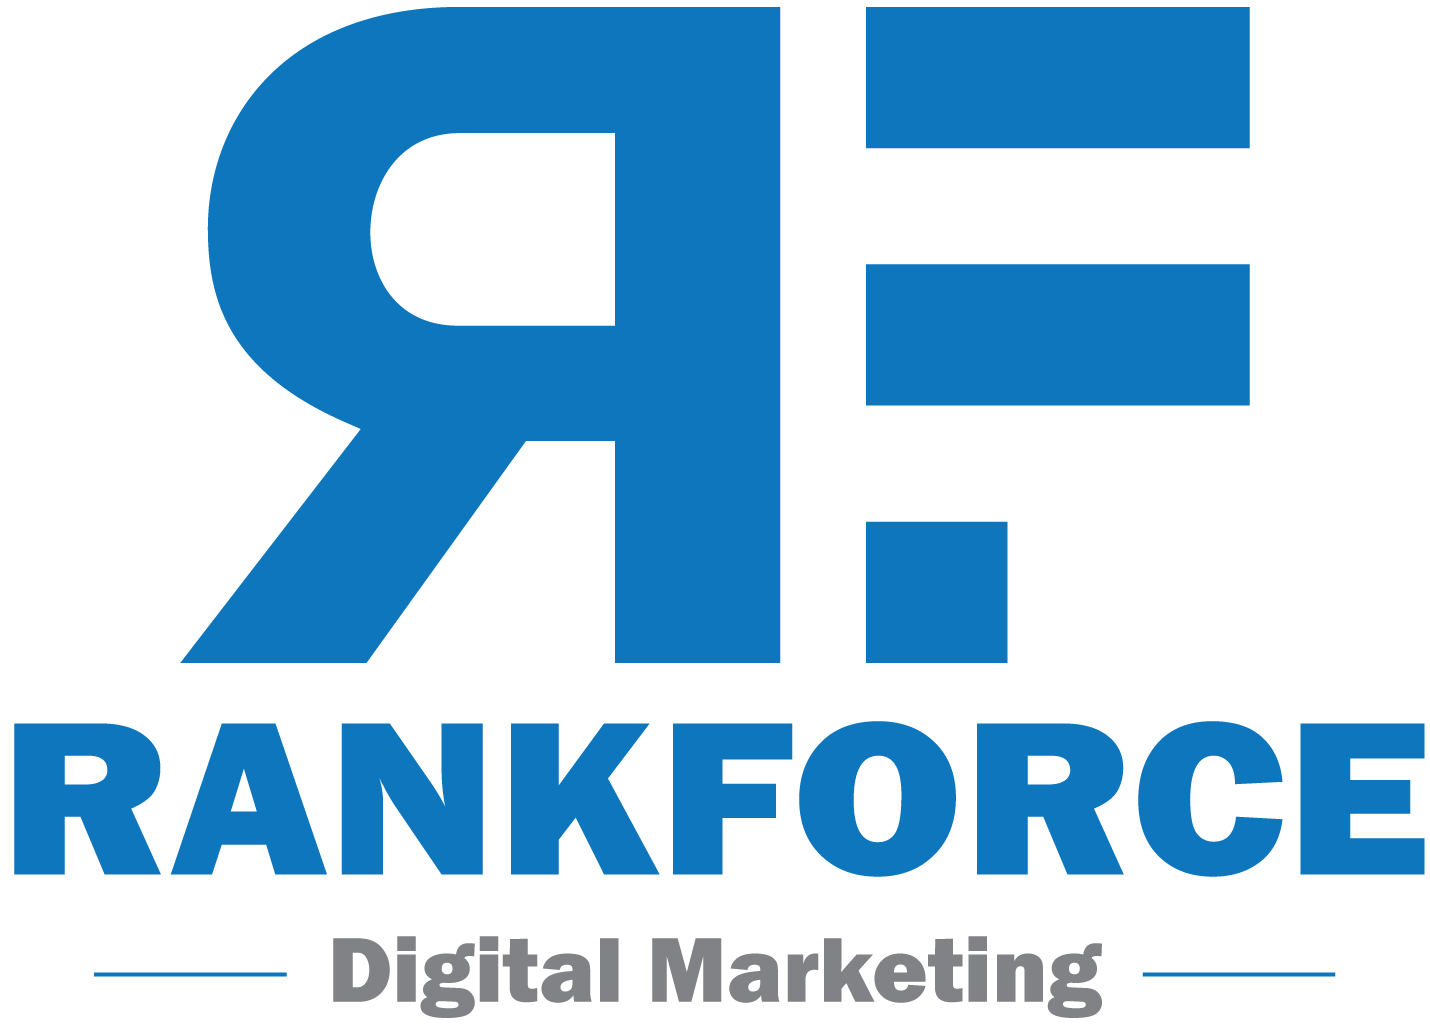 Rank Force Digital